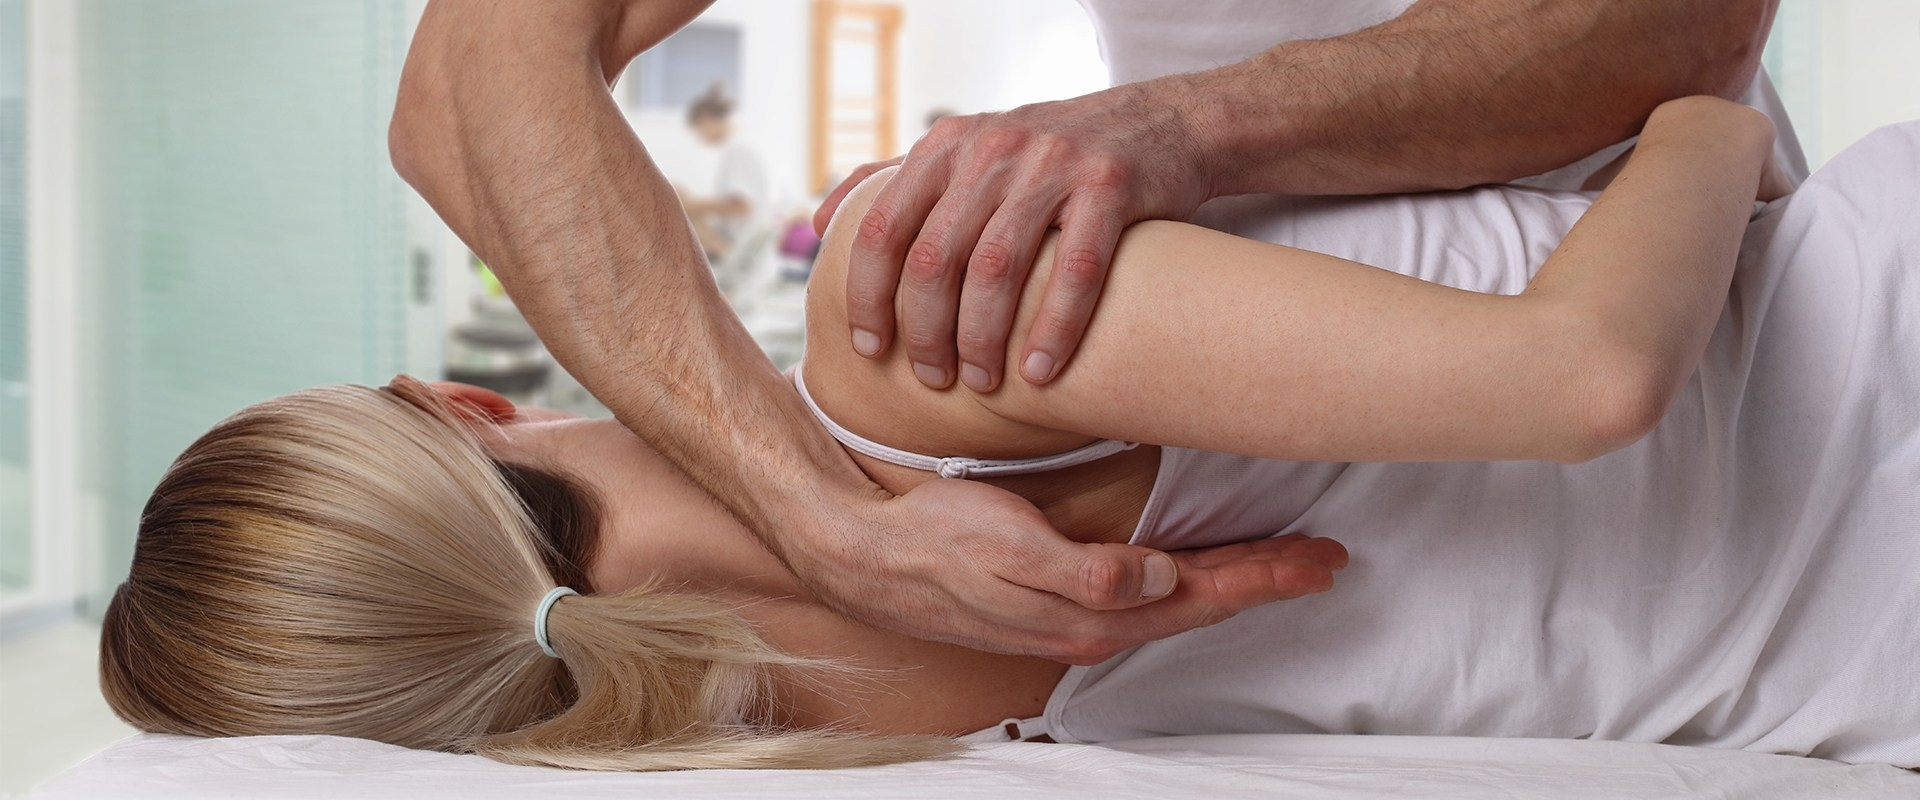 Toronto Neck And Back Pain Clinic (@torontoneckandbackpainclinic) Cover Image